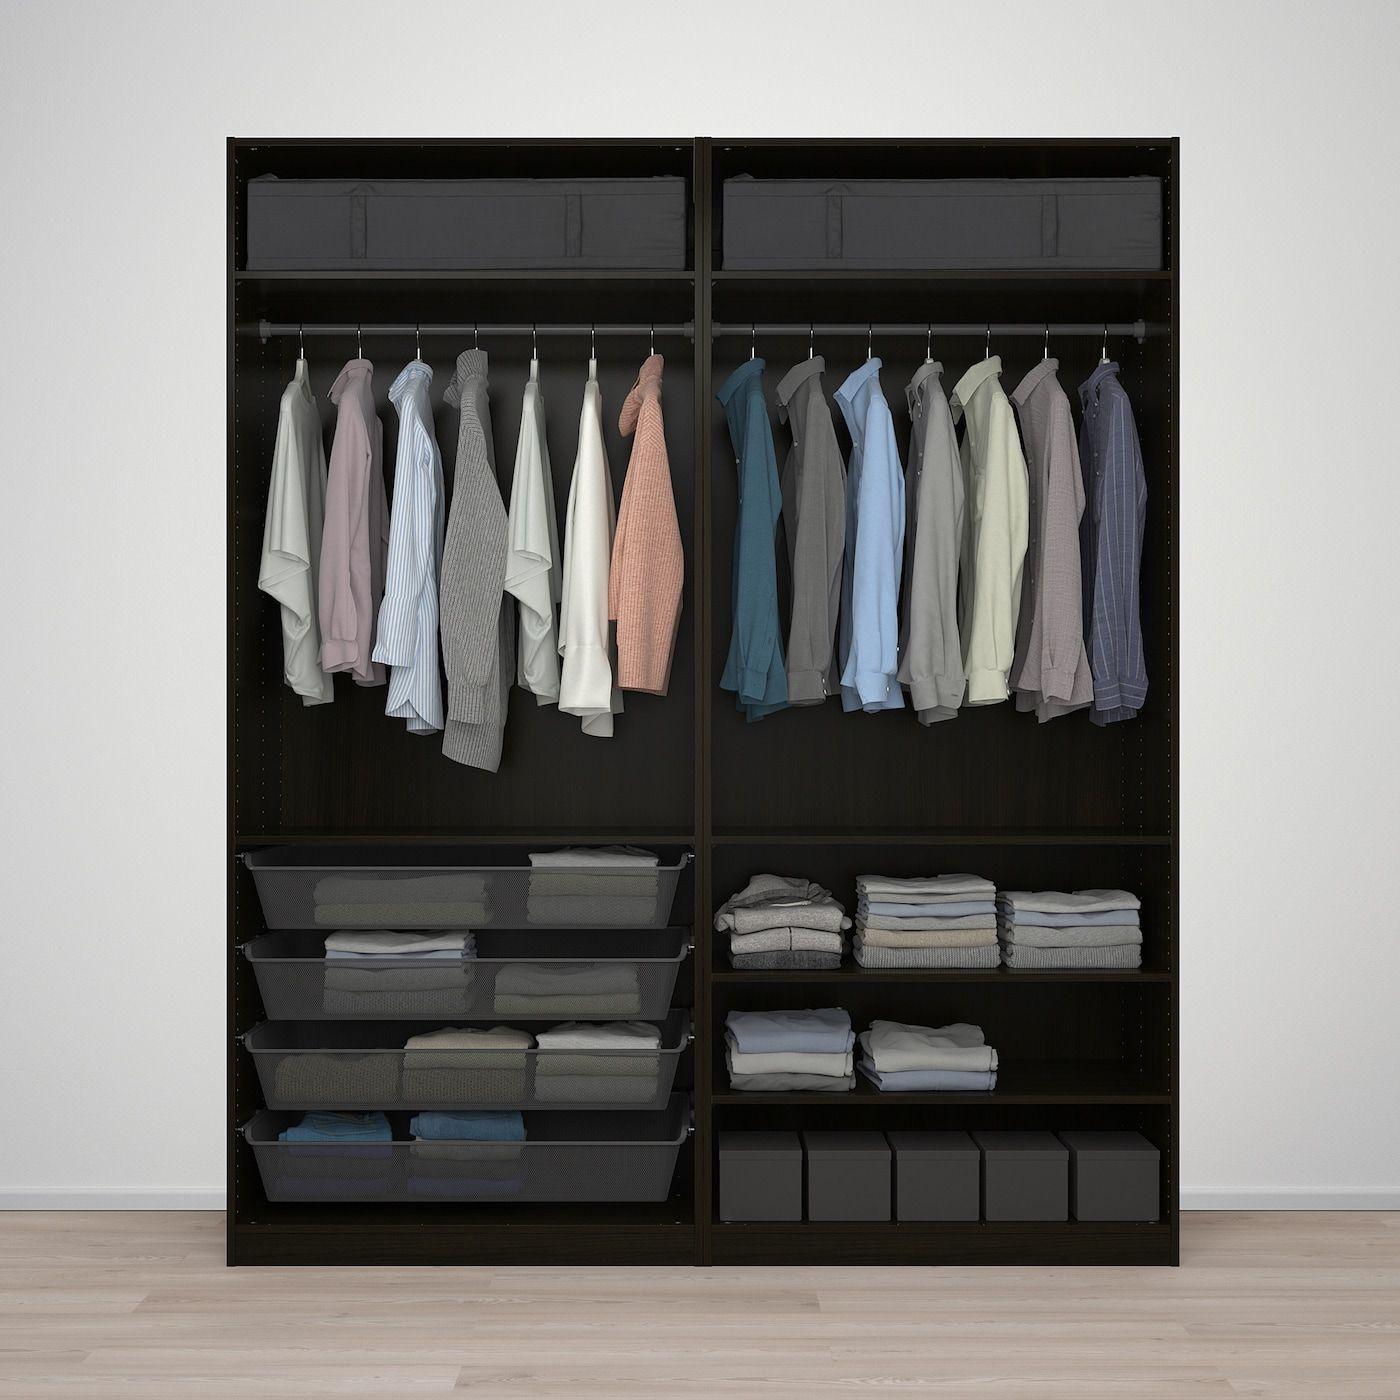 IKEA PAX Wardrobe Pax wardrobe, Ikea pax, Ikea pax